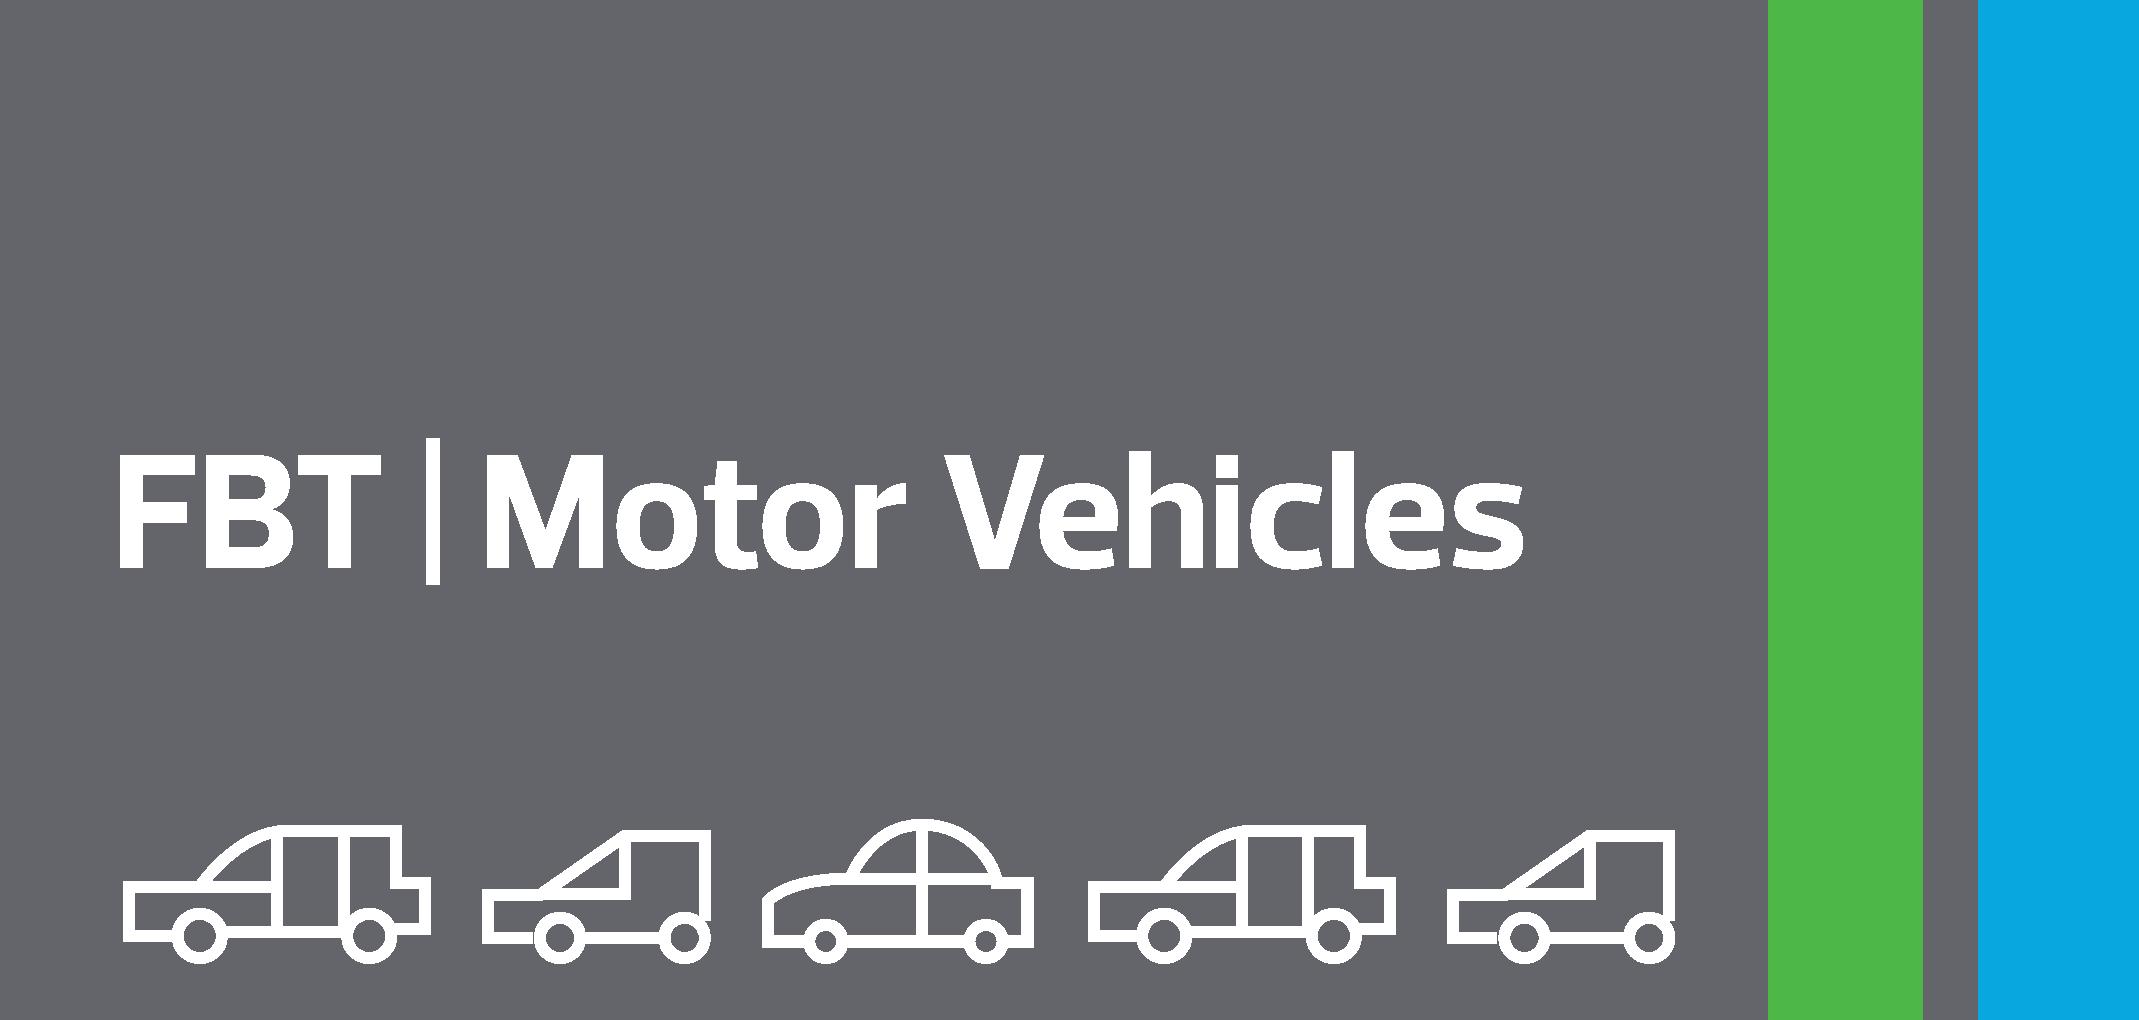 FBT motor vehicles